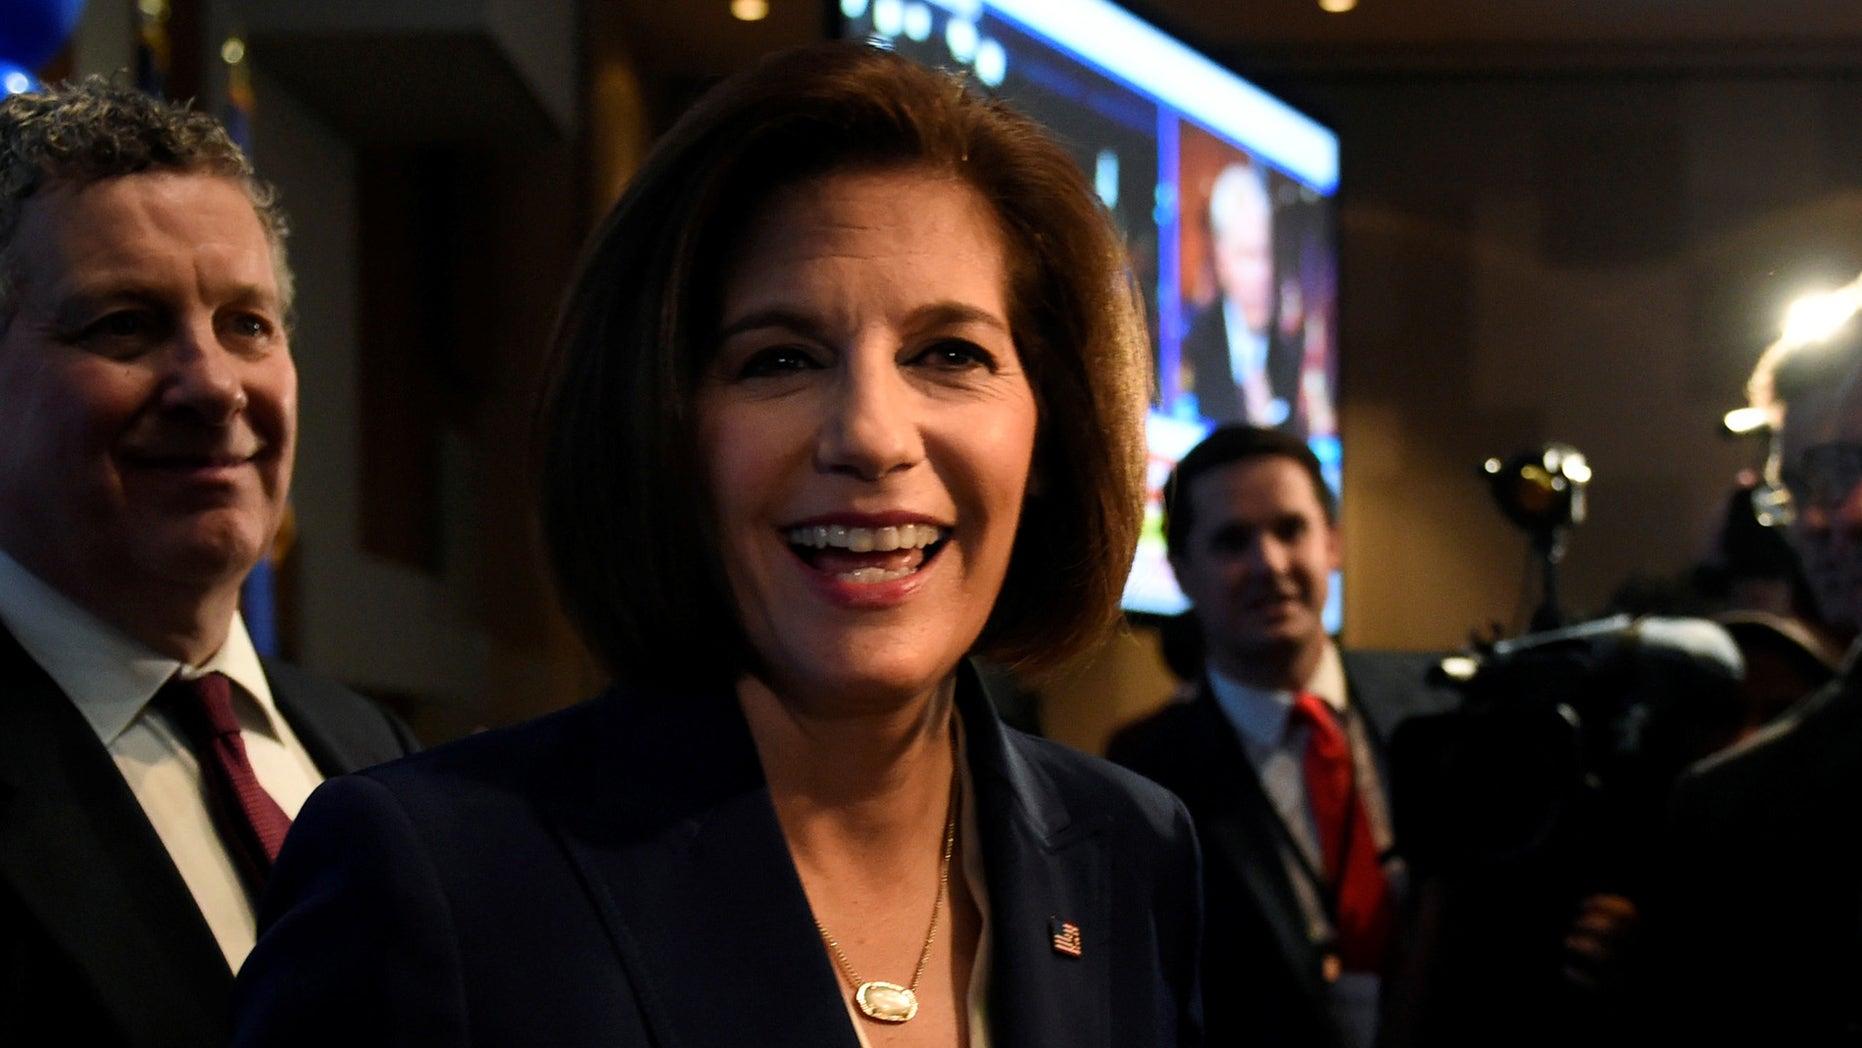 Nevada's freshman Democratic senator, Catherine Cortez Masto, wants to mandate diversity quotas in Congress.